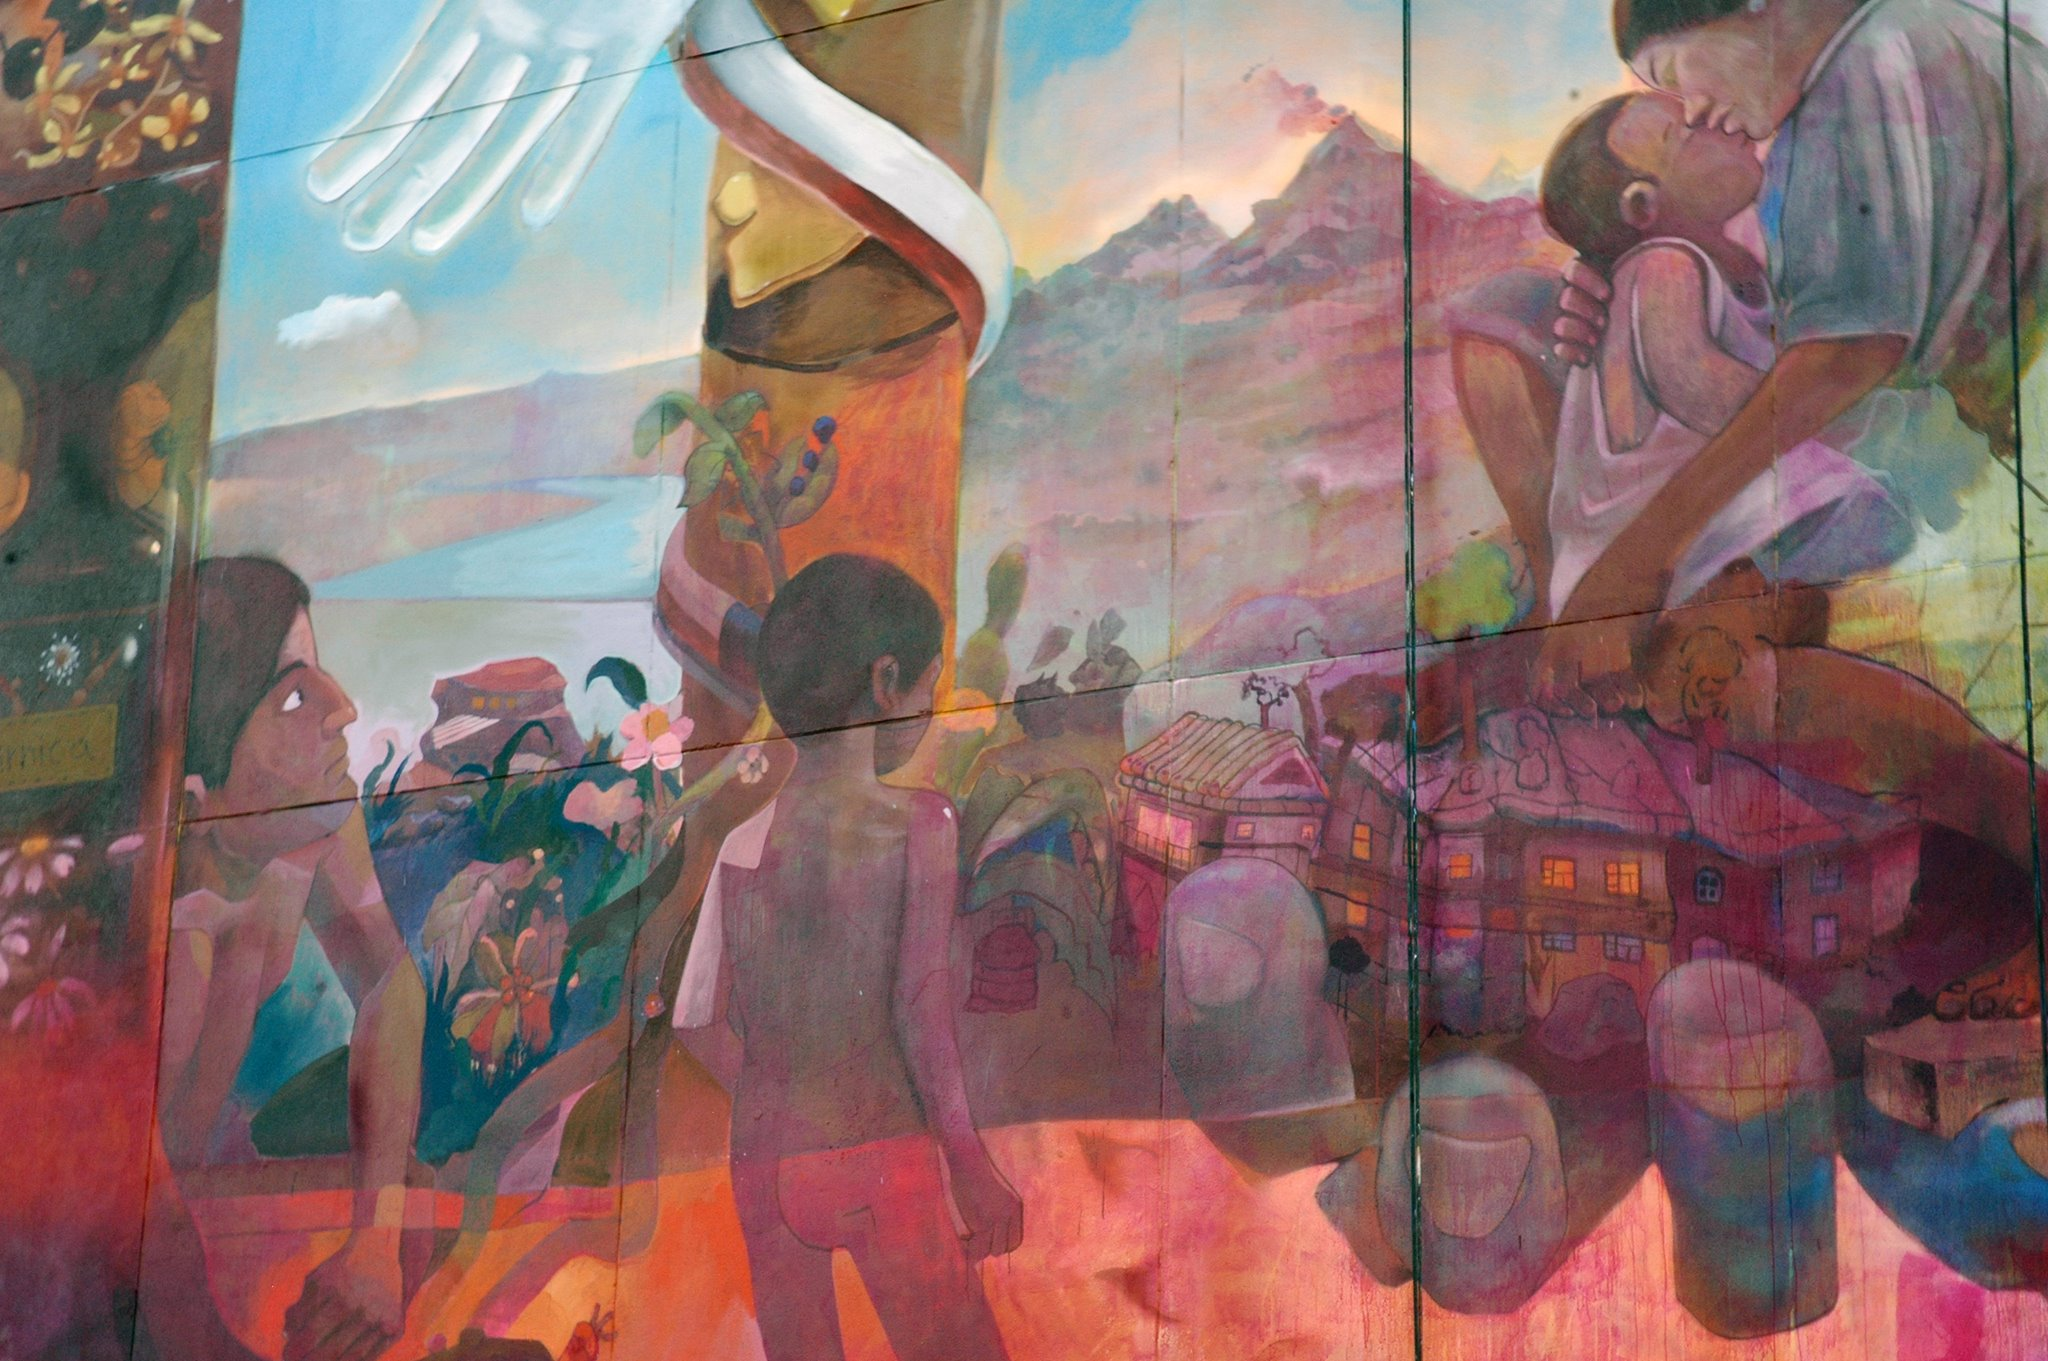 dhear-one-similia-similibus-curentur-new-mural-15